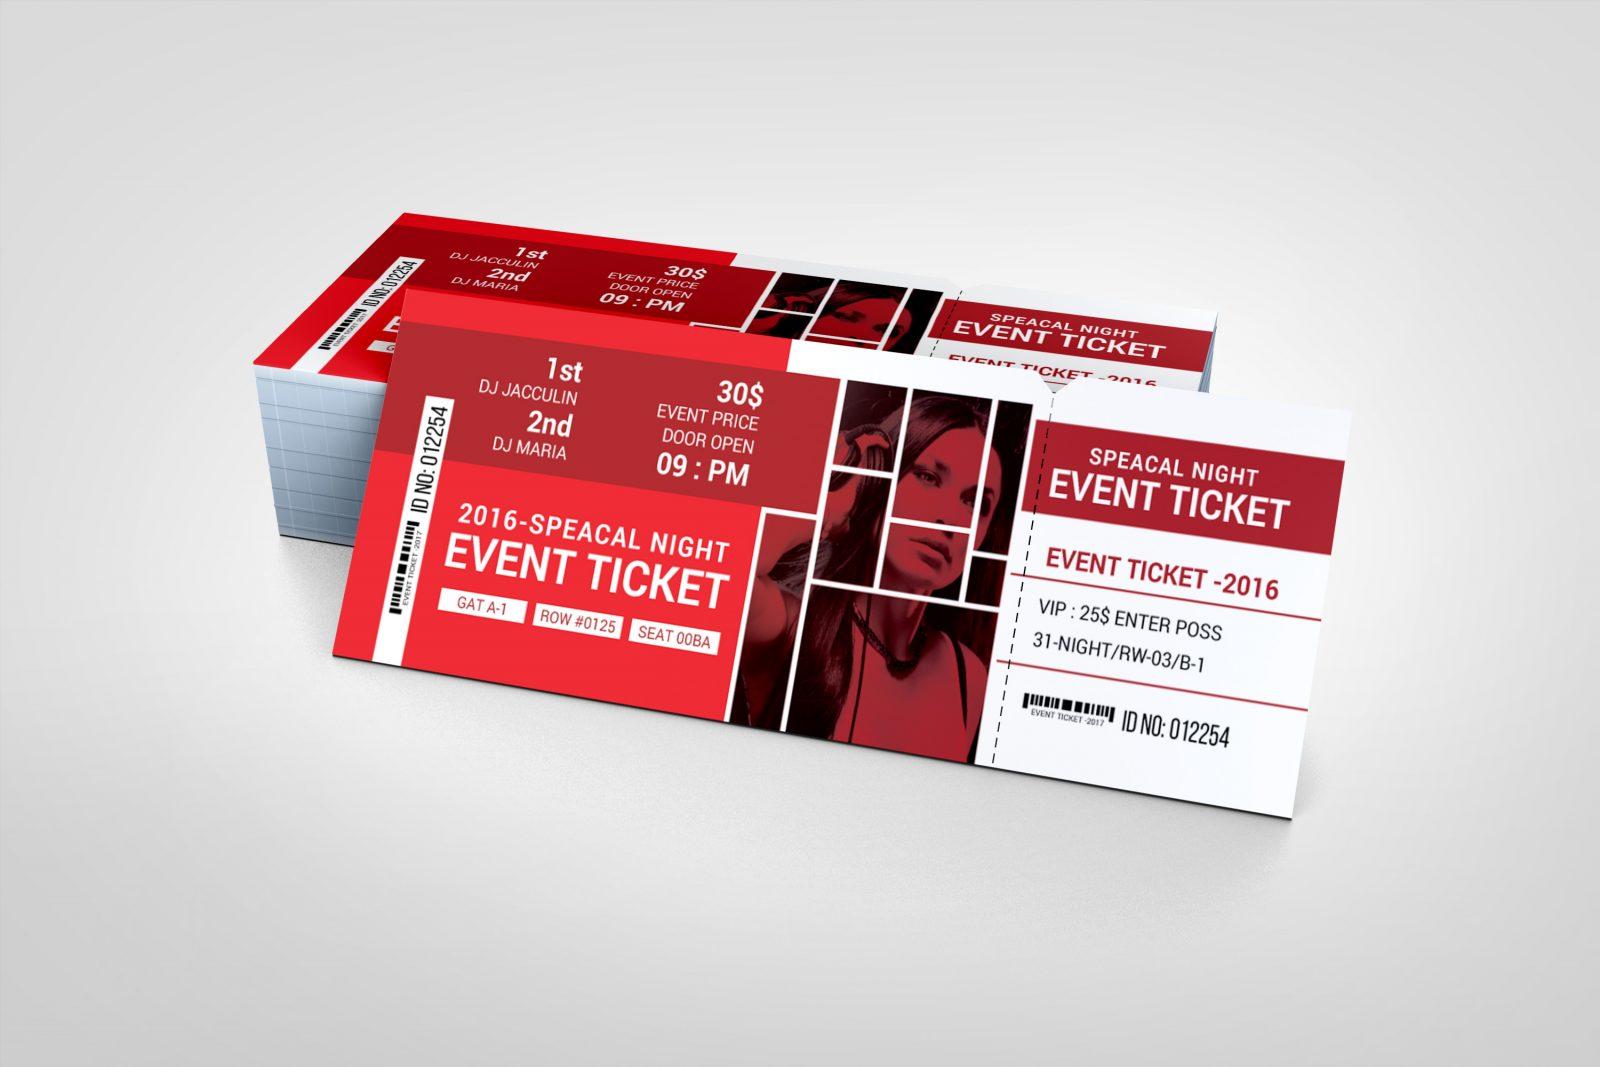 london event ticket design template 001972